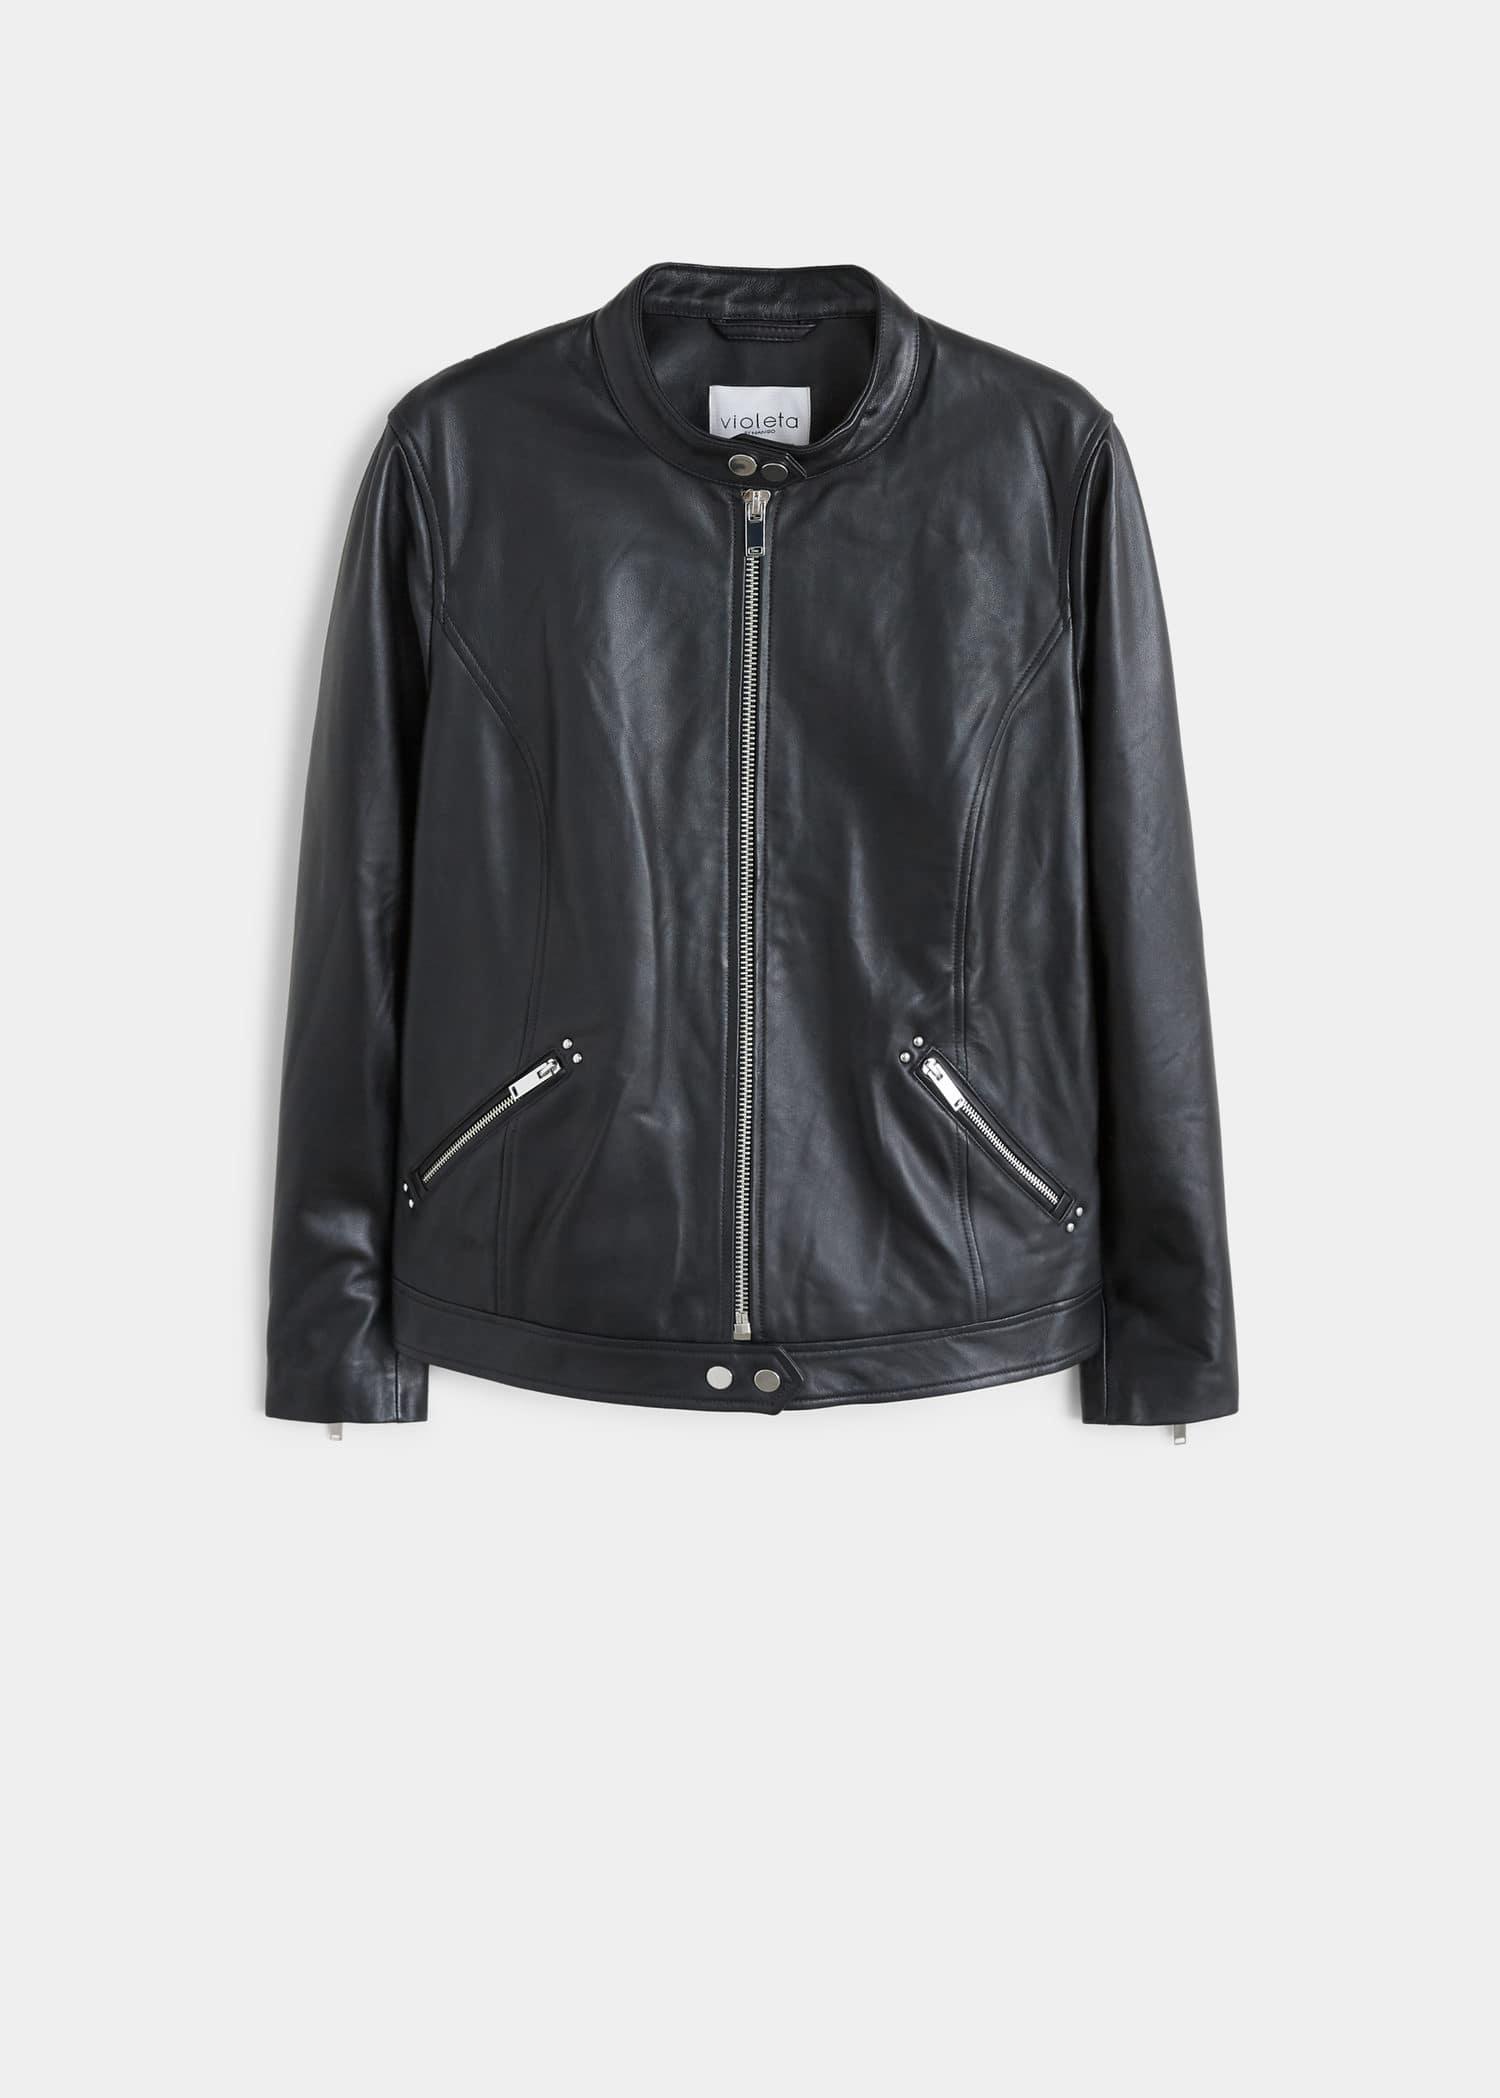 Lederjacke mit zipper Große größen | Violeta by Mango Schweiz